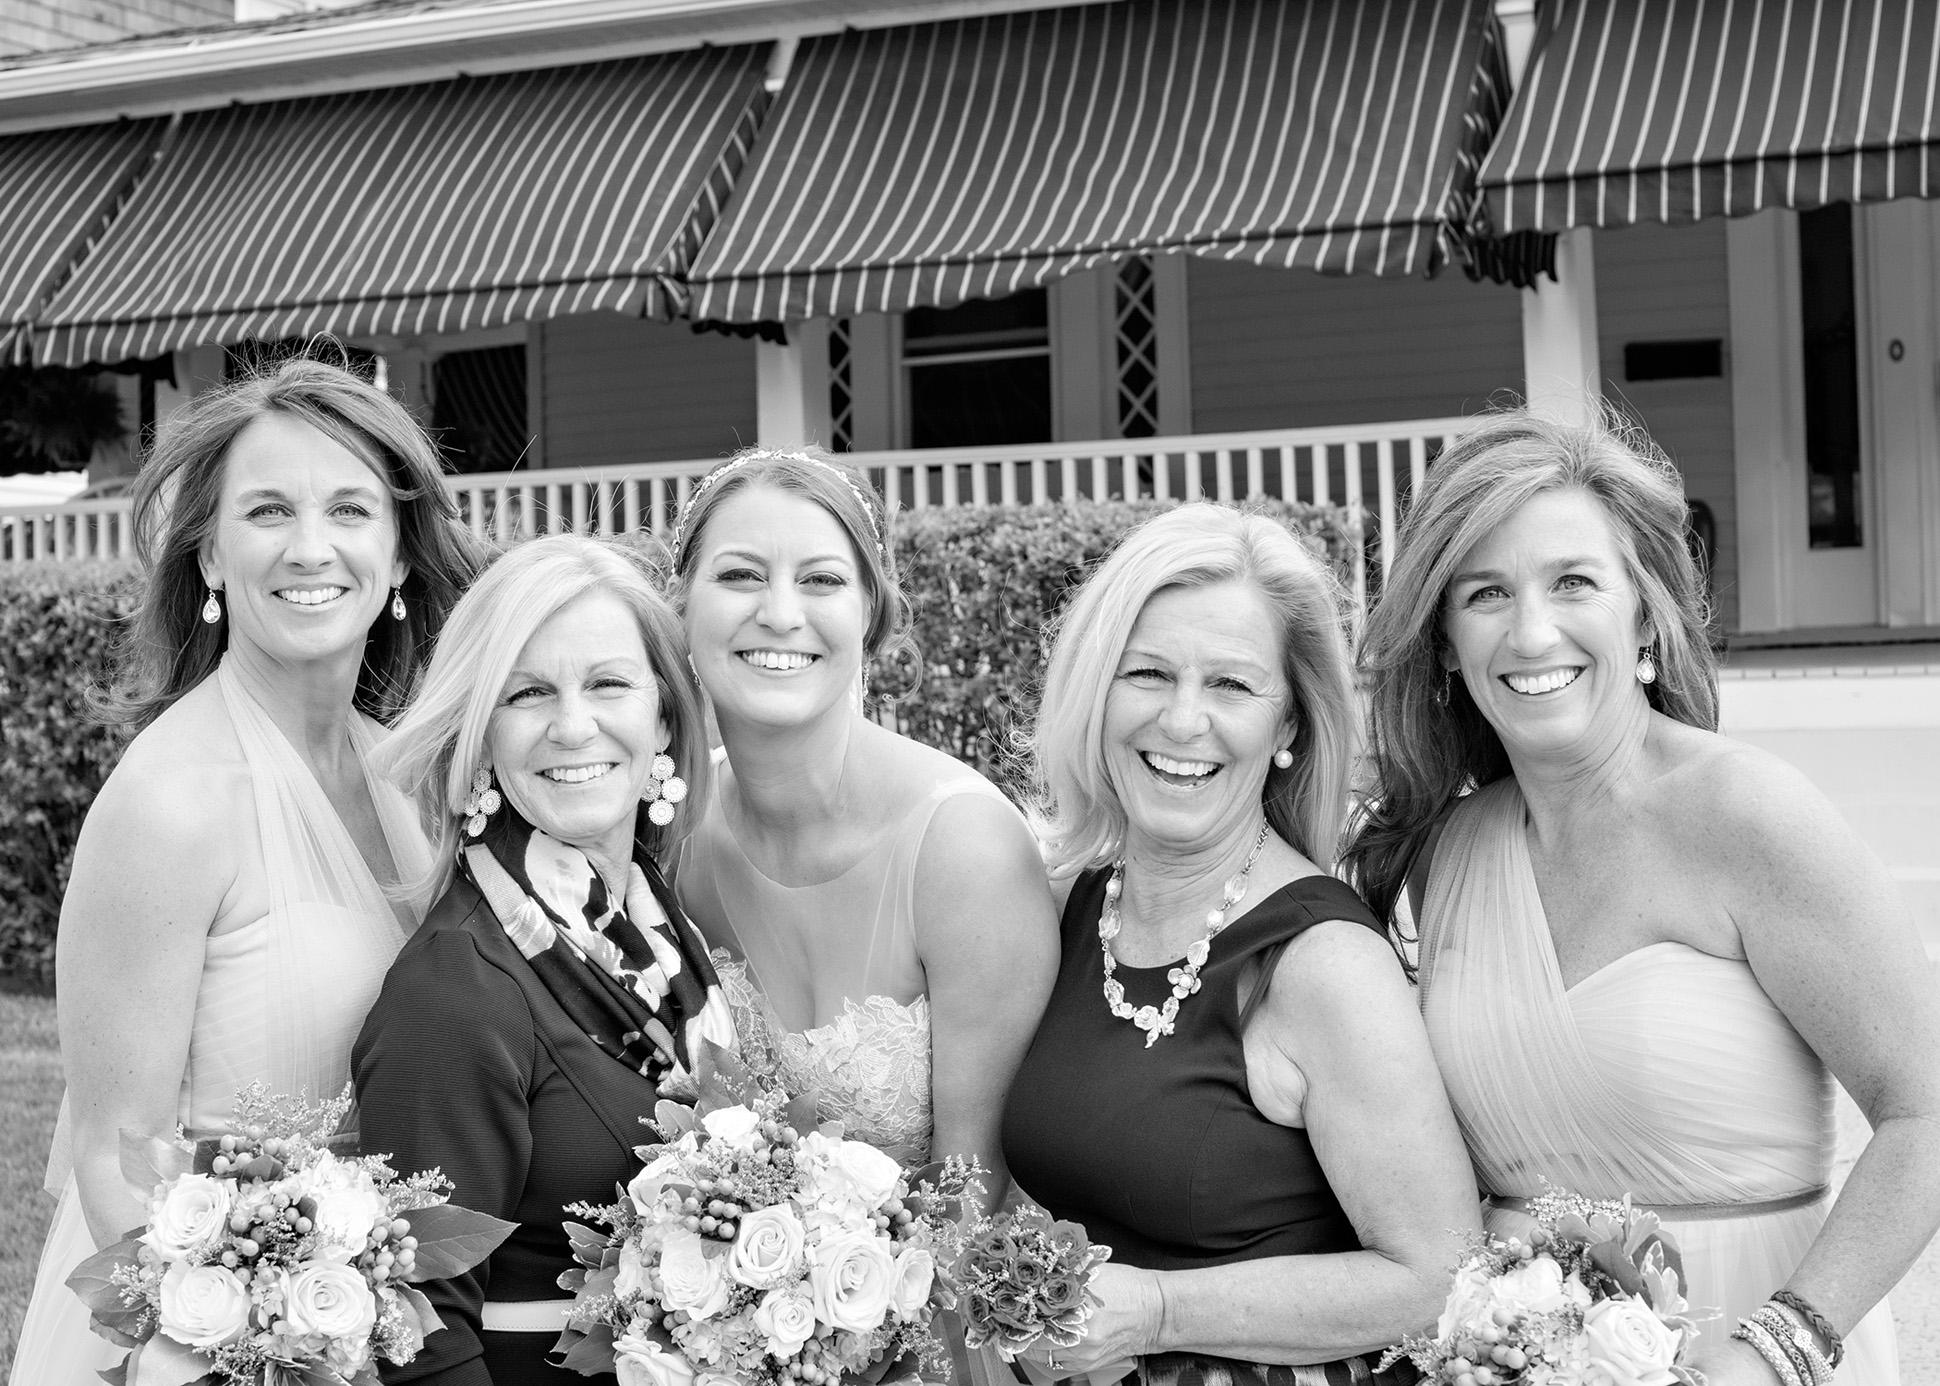 09-Sara Stadtmiller-SRS-Photography-Asbury-Park-Wedding-Photographer-Monmouth-County-Wedding-Photographer-NJ-Wedding-Photographer-Avon-by-the-Sea-Wedding-The-Columns-Wedding-bhldn-dress